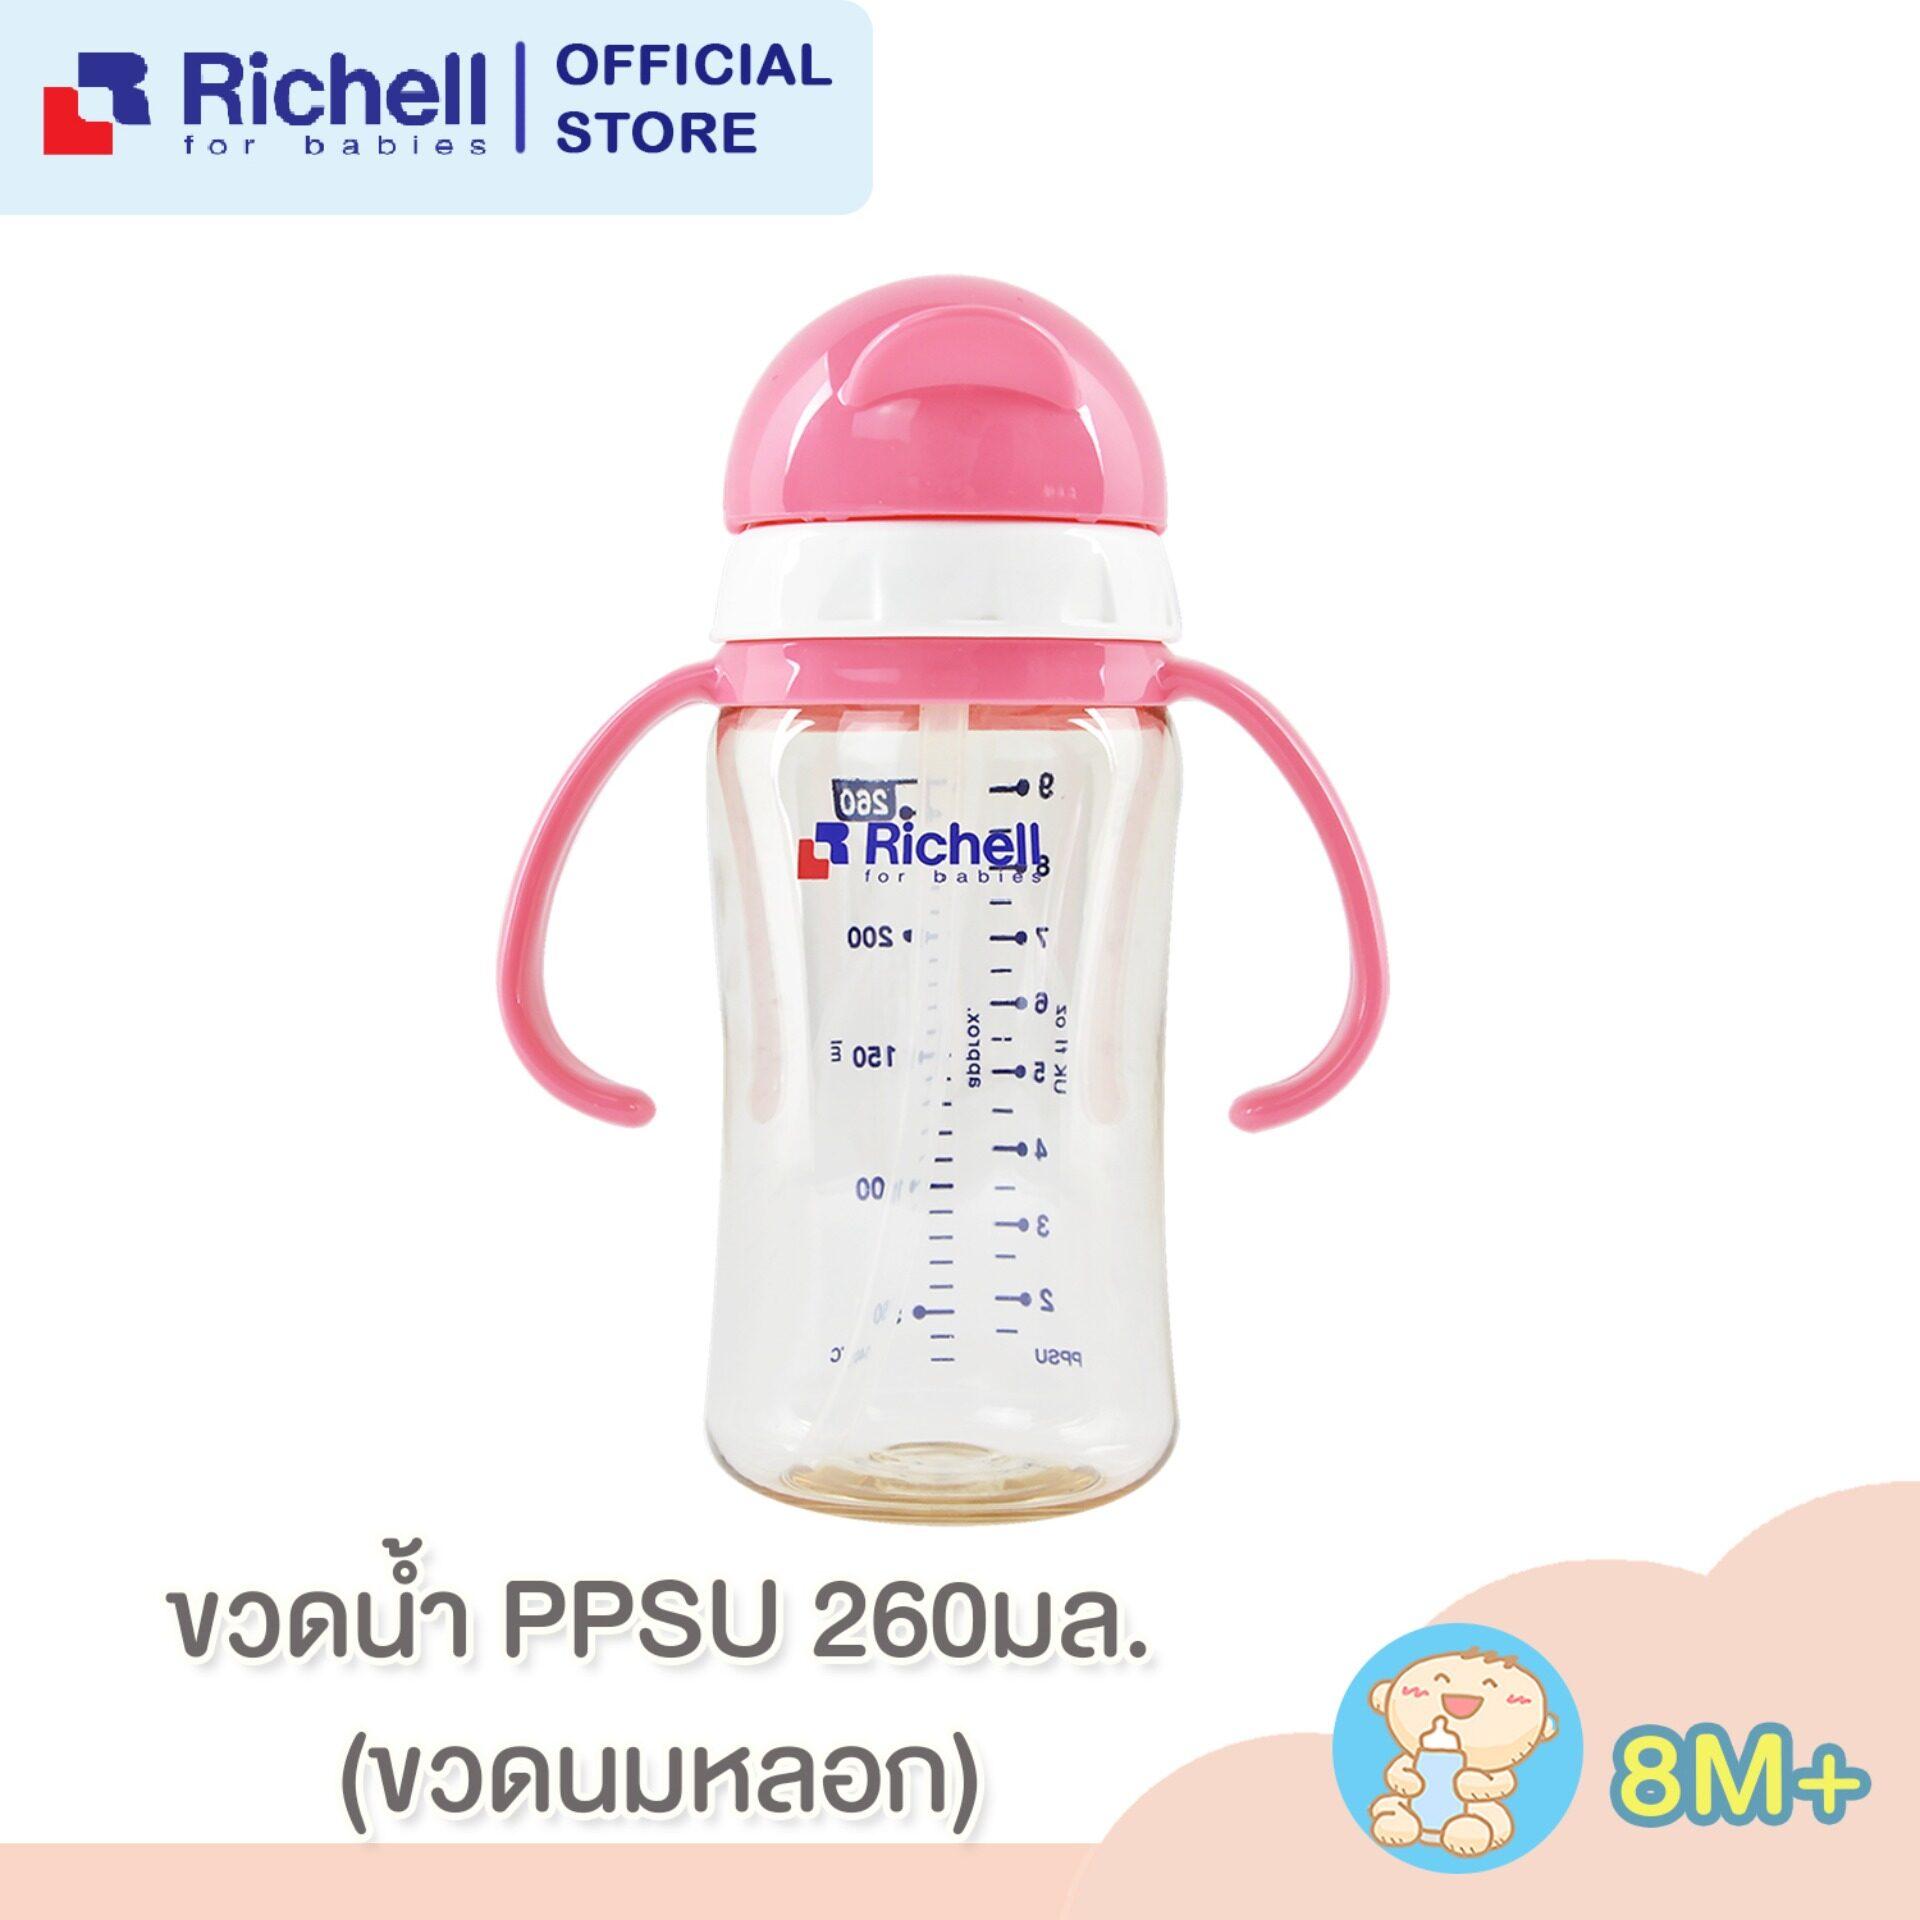 Richell (ริเชล) ขวดน้ำ ขวดนมหลอก ขนาด 260 Ml. ระบบสุญญากาศป้องกันการหก ทำมาจาก Pp.